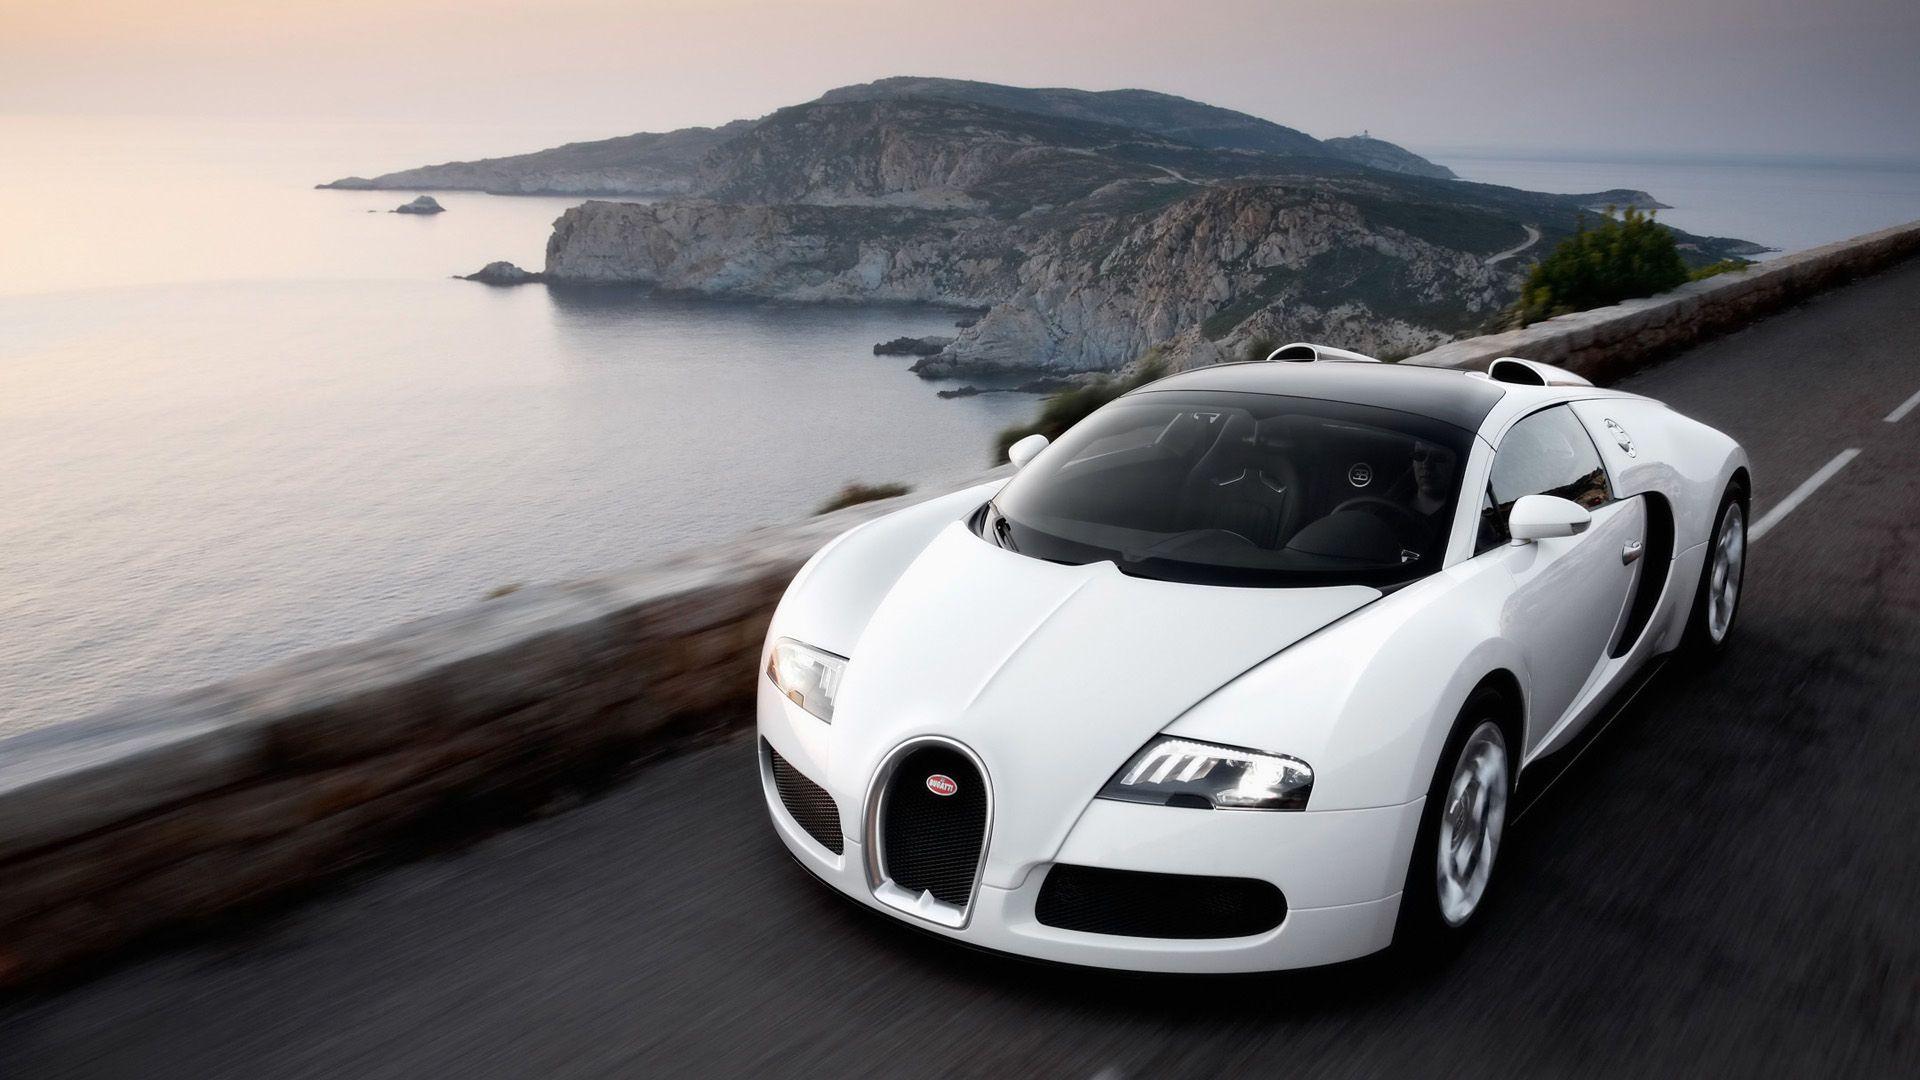 2009 Bugatti Veyron 16 4 Grand Sport Specs Wallpaper Bugatti Veyron 16 Bugatti Veyron Veyron